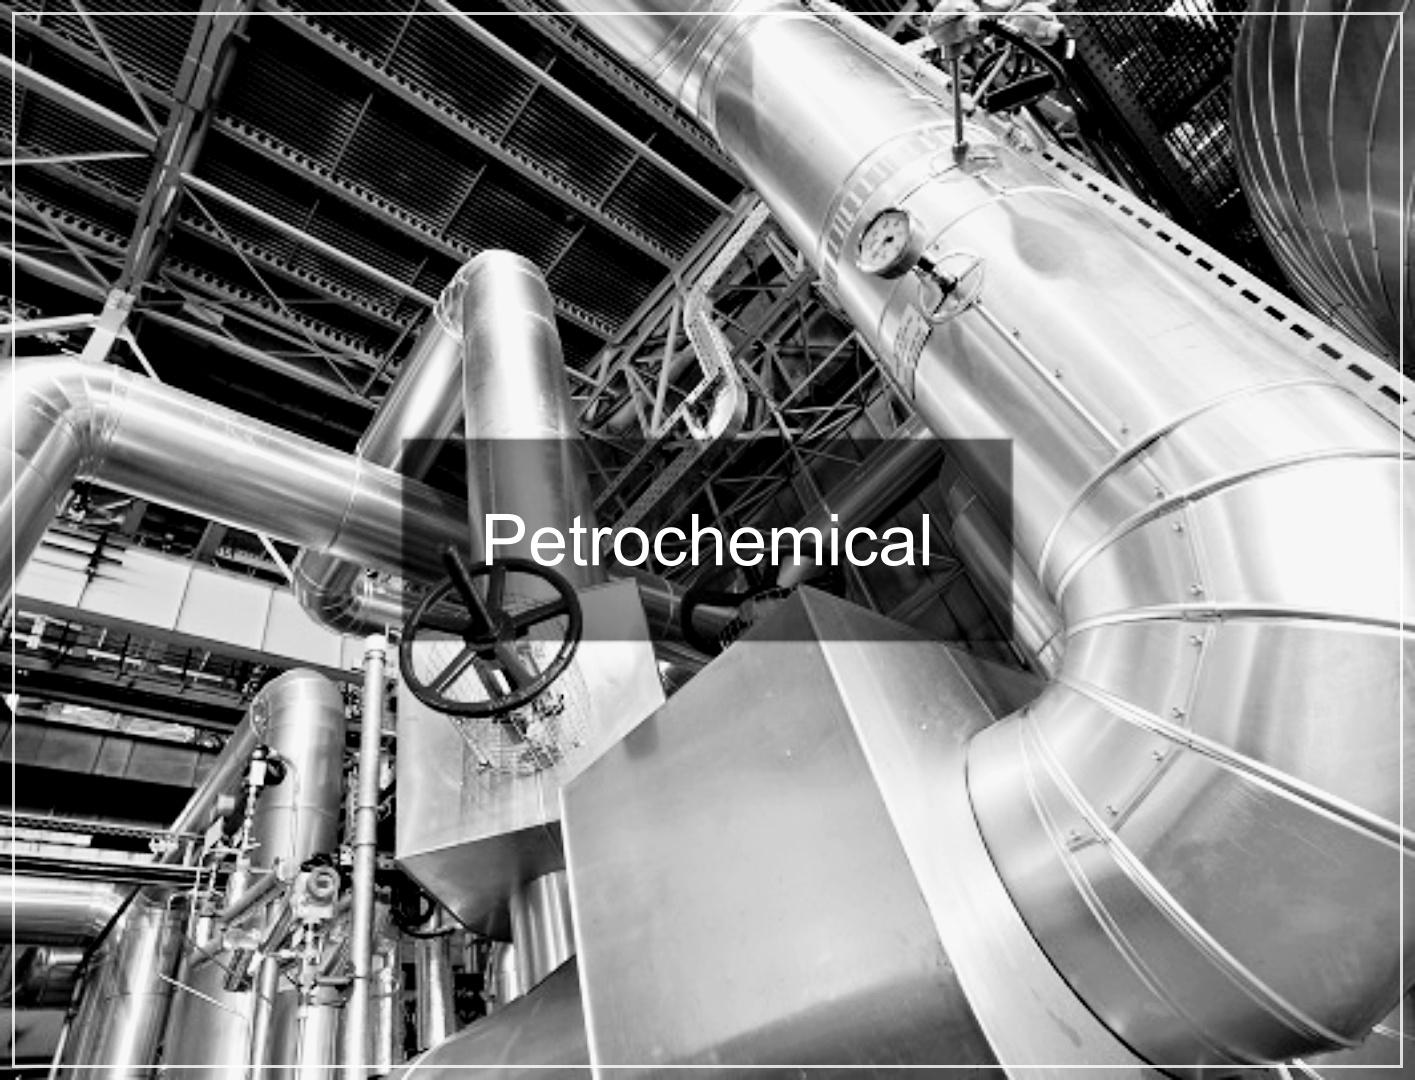 columnblackpetrol-chemicaltext